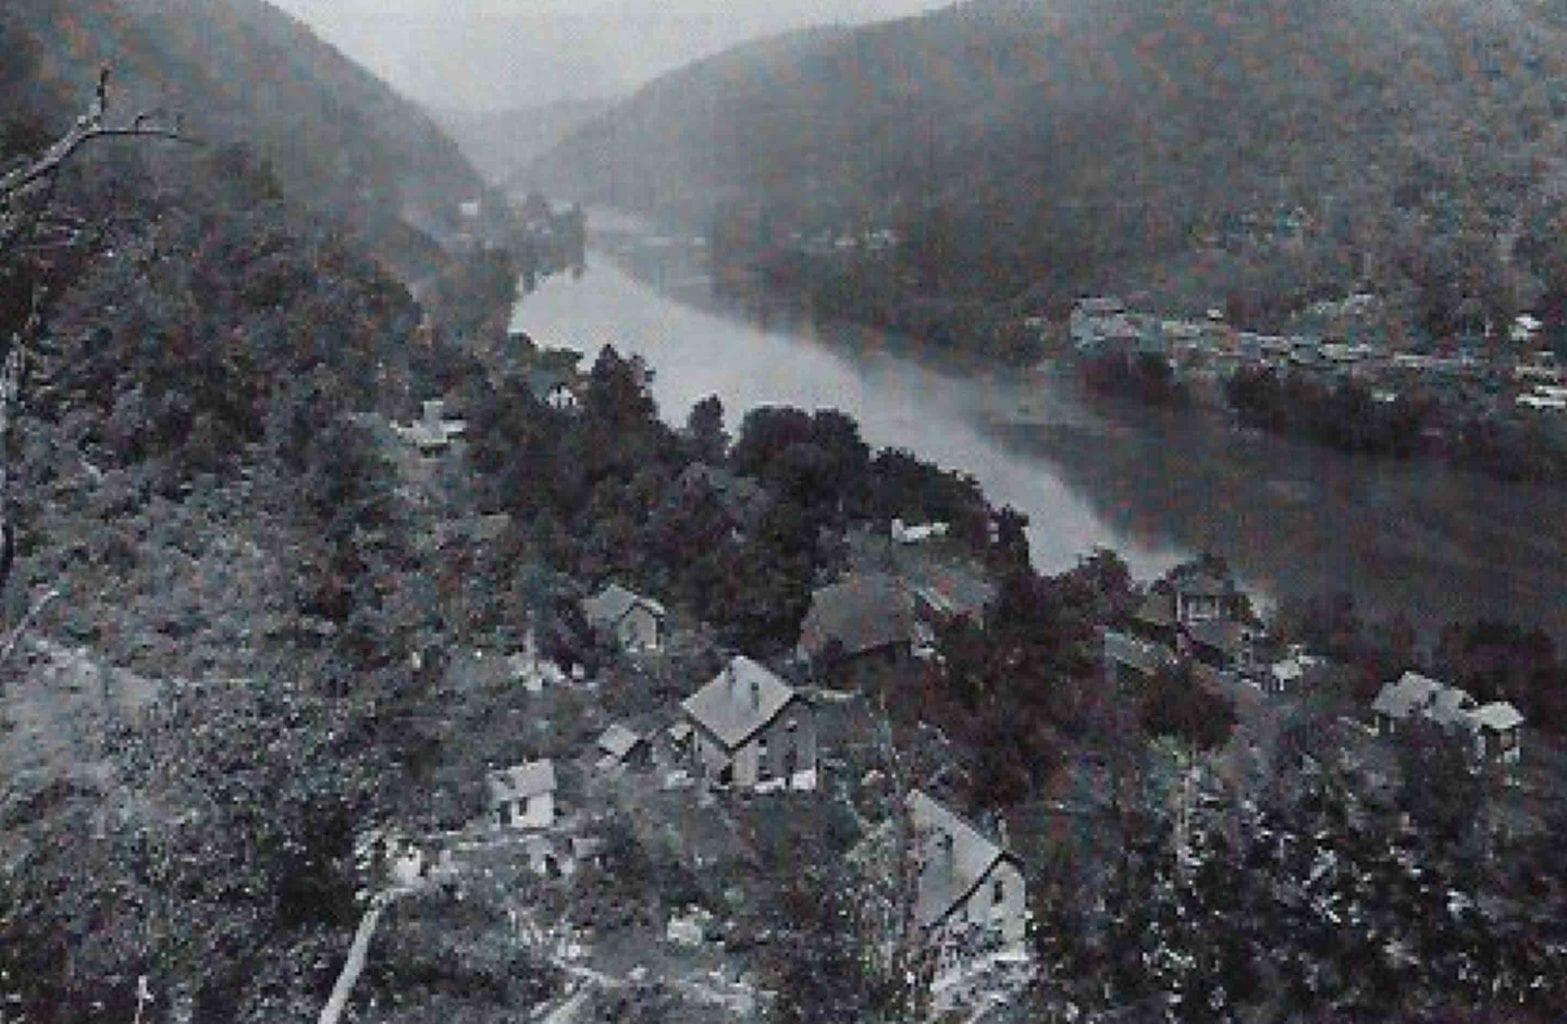 New River Gorge: Murder & Mayhem